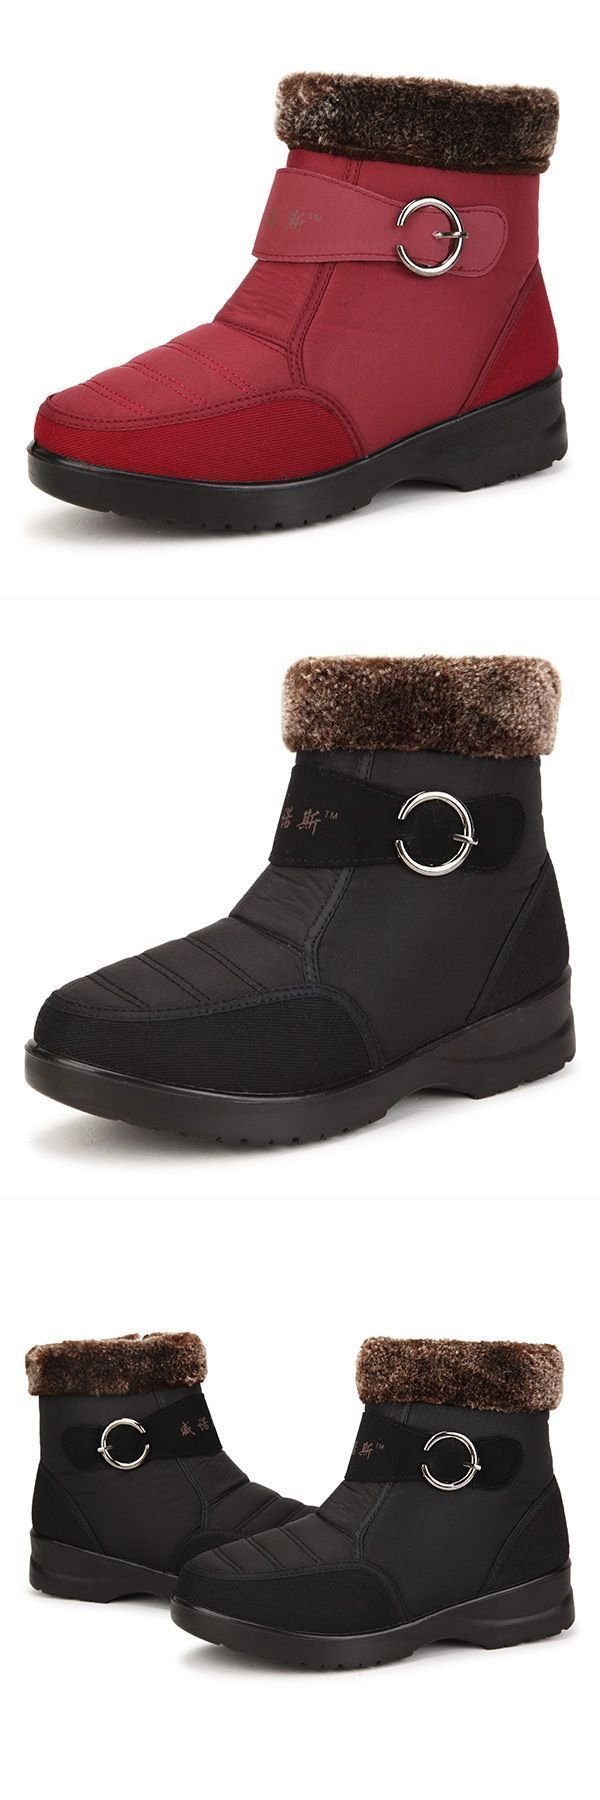 J Boots Eq New Women Winter Down Flat Keep Warm Low Top Plush Cotton Waterproof Snow